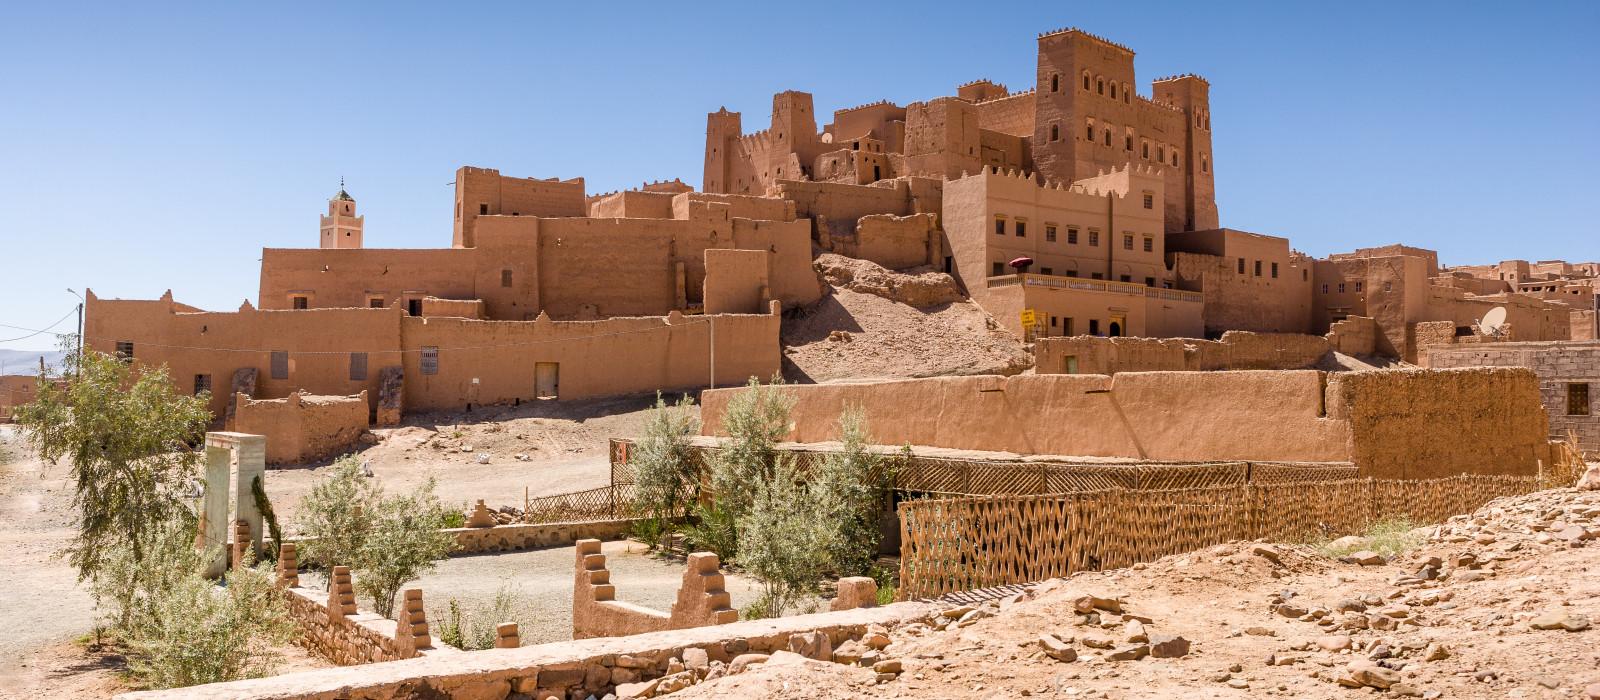 Hotel Riad Lamane Zagora Morocco